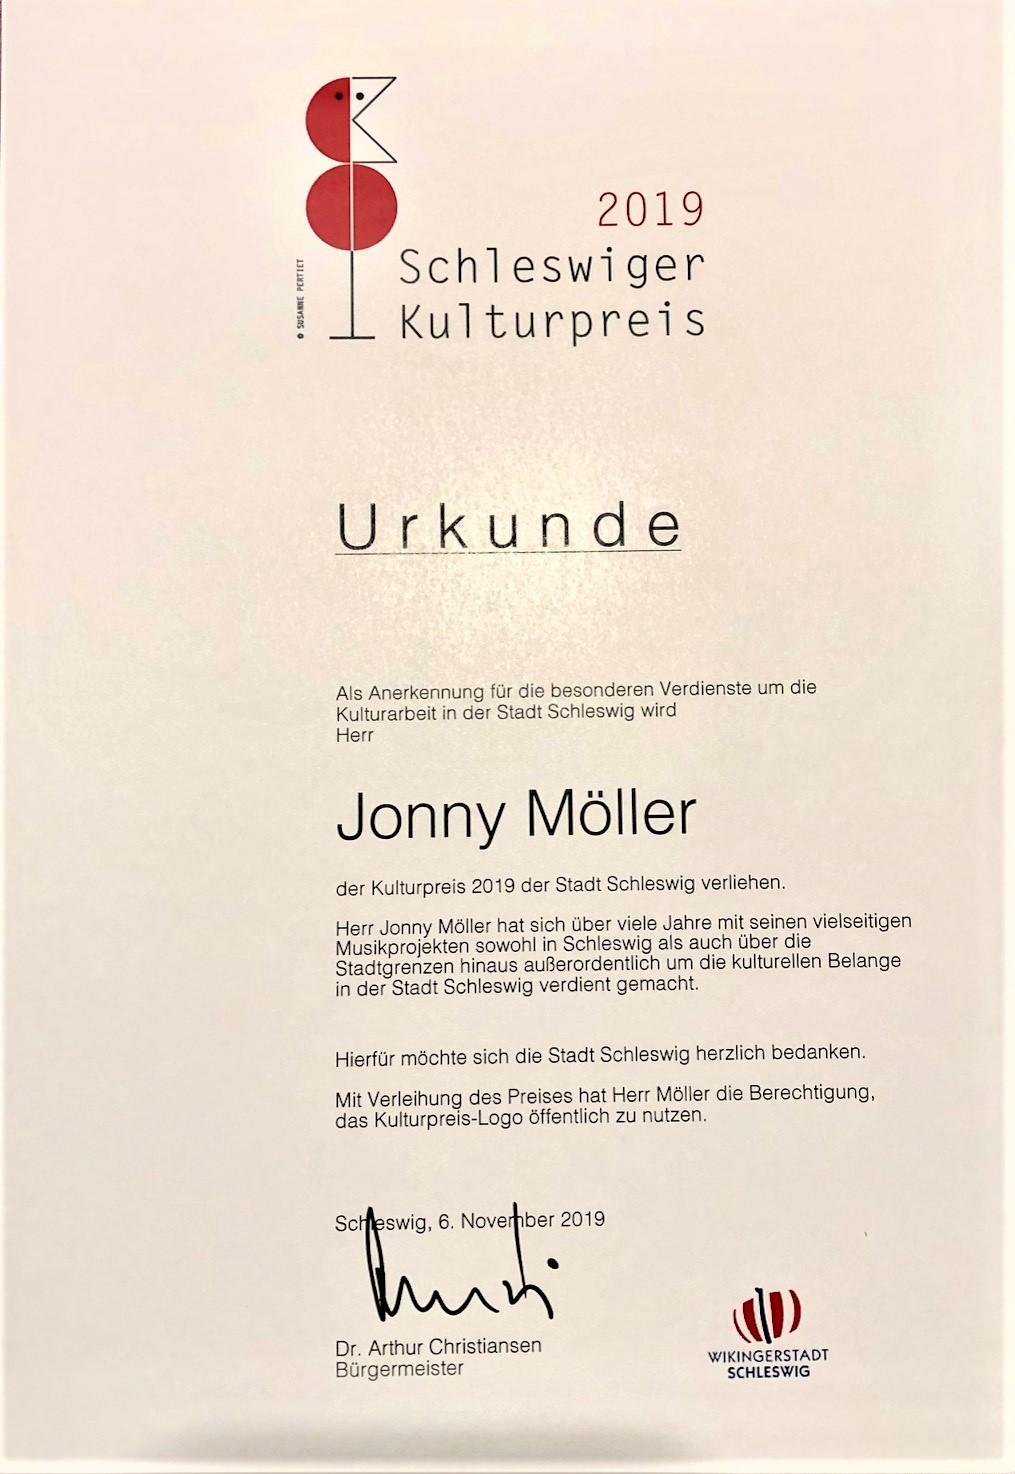 Kulturpreis Jonny Möller